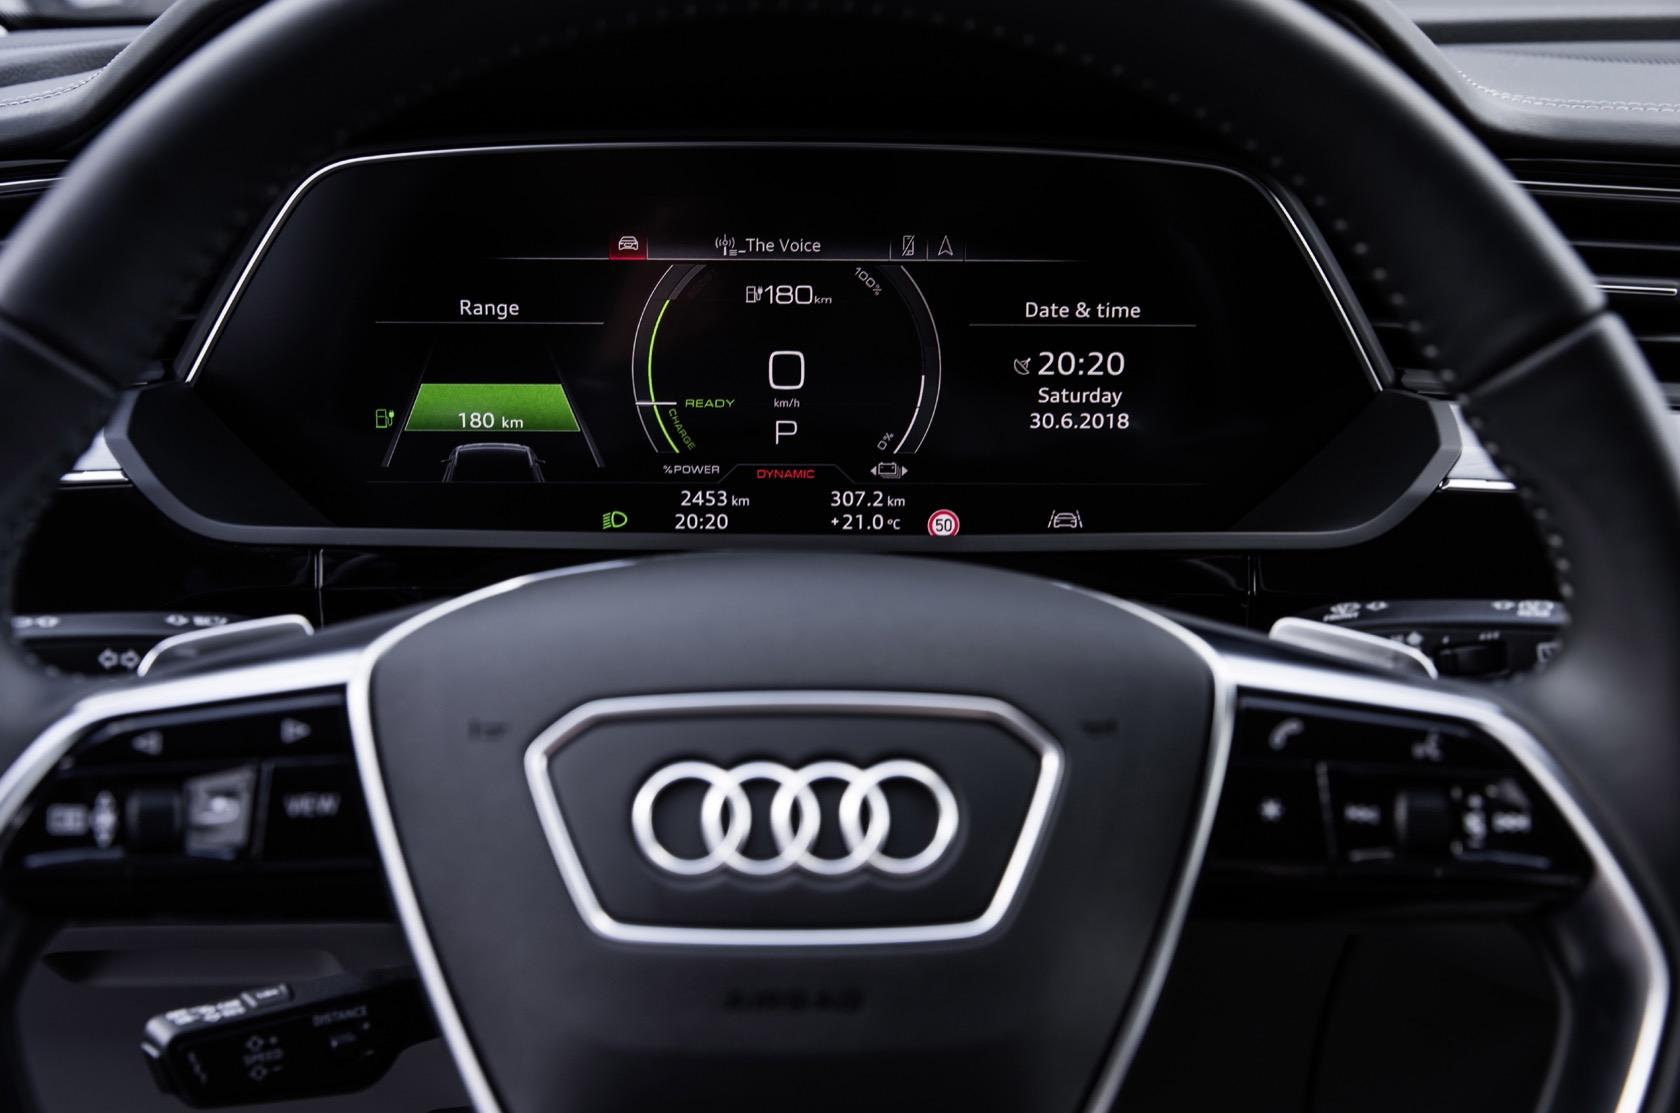 The 2020 Audi e-tron's cabin is an EV tech haven - SlashGear